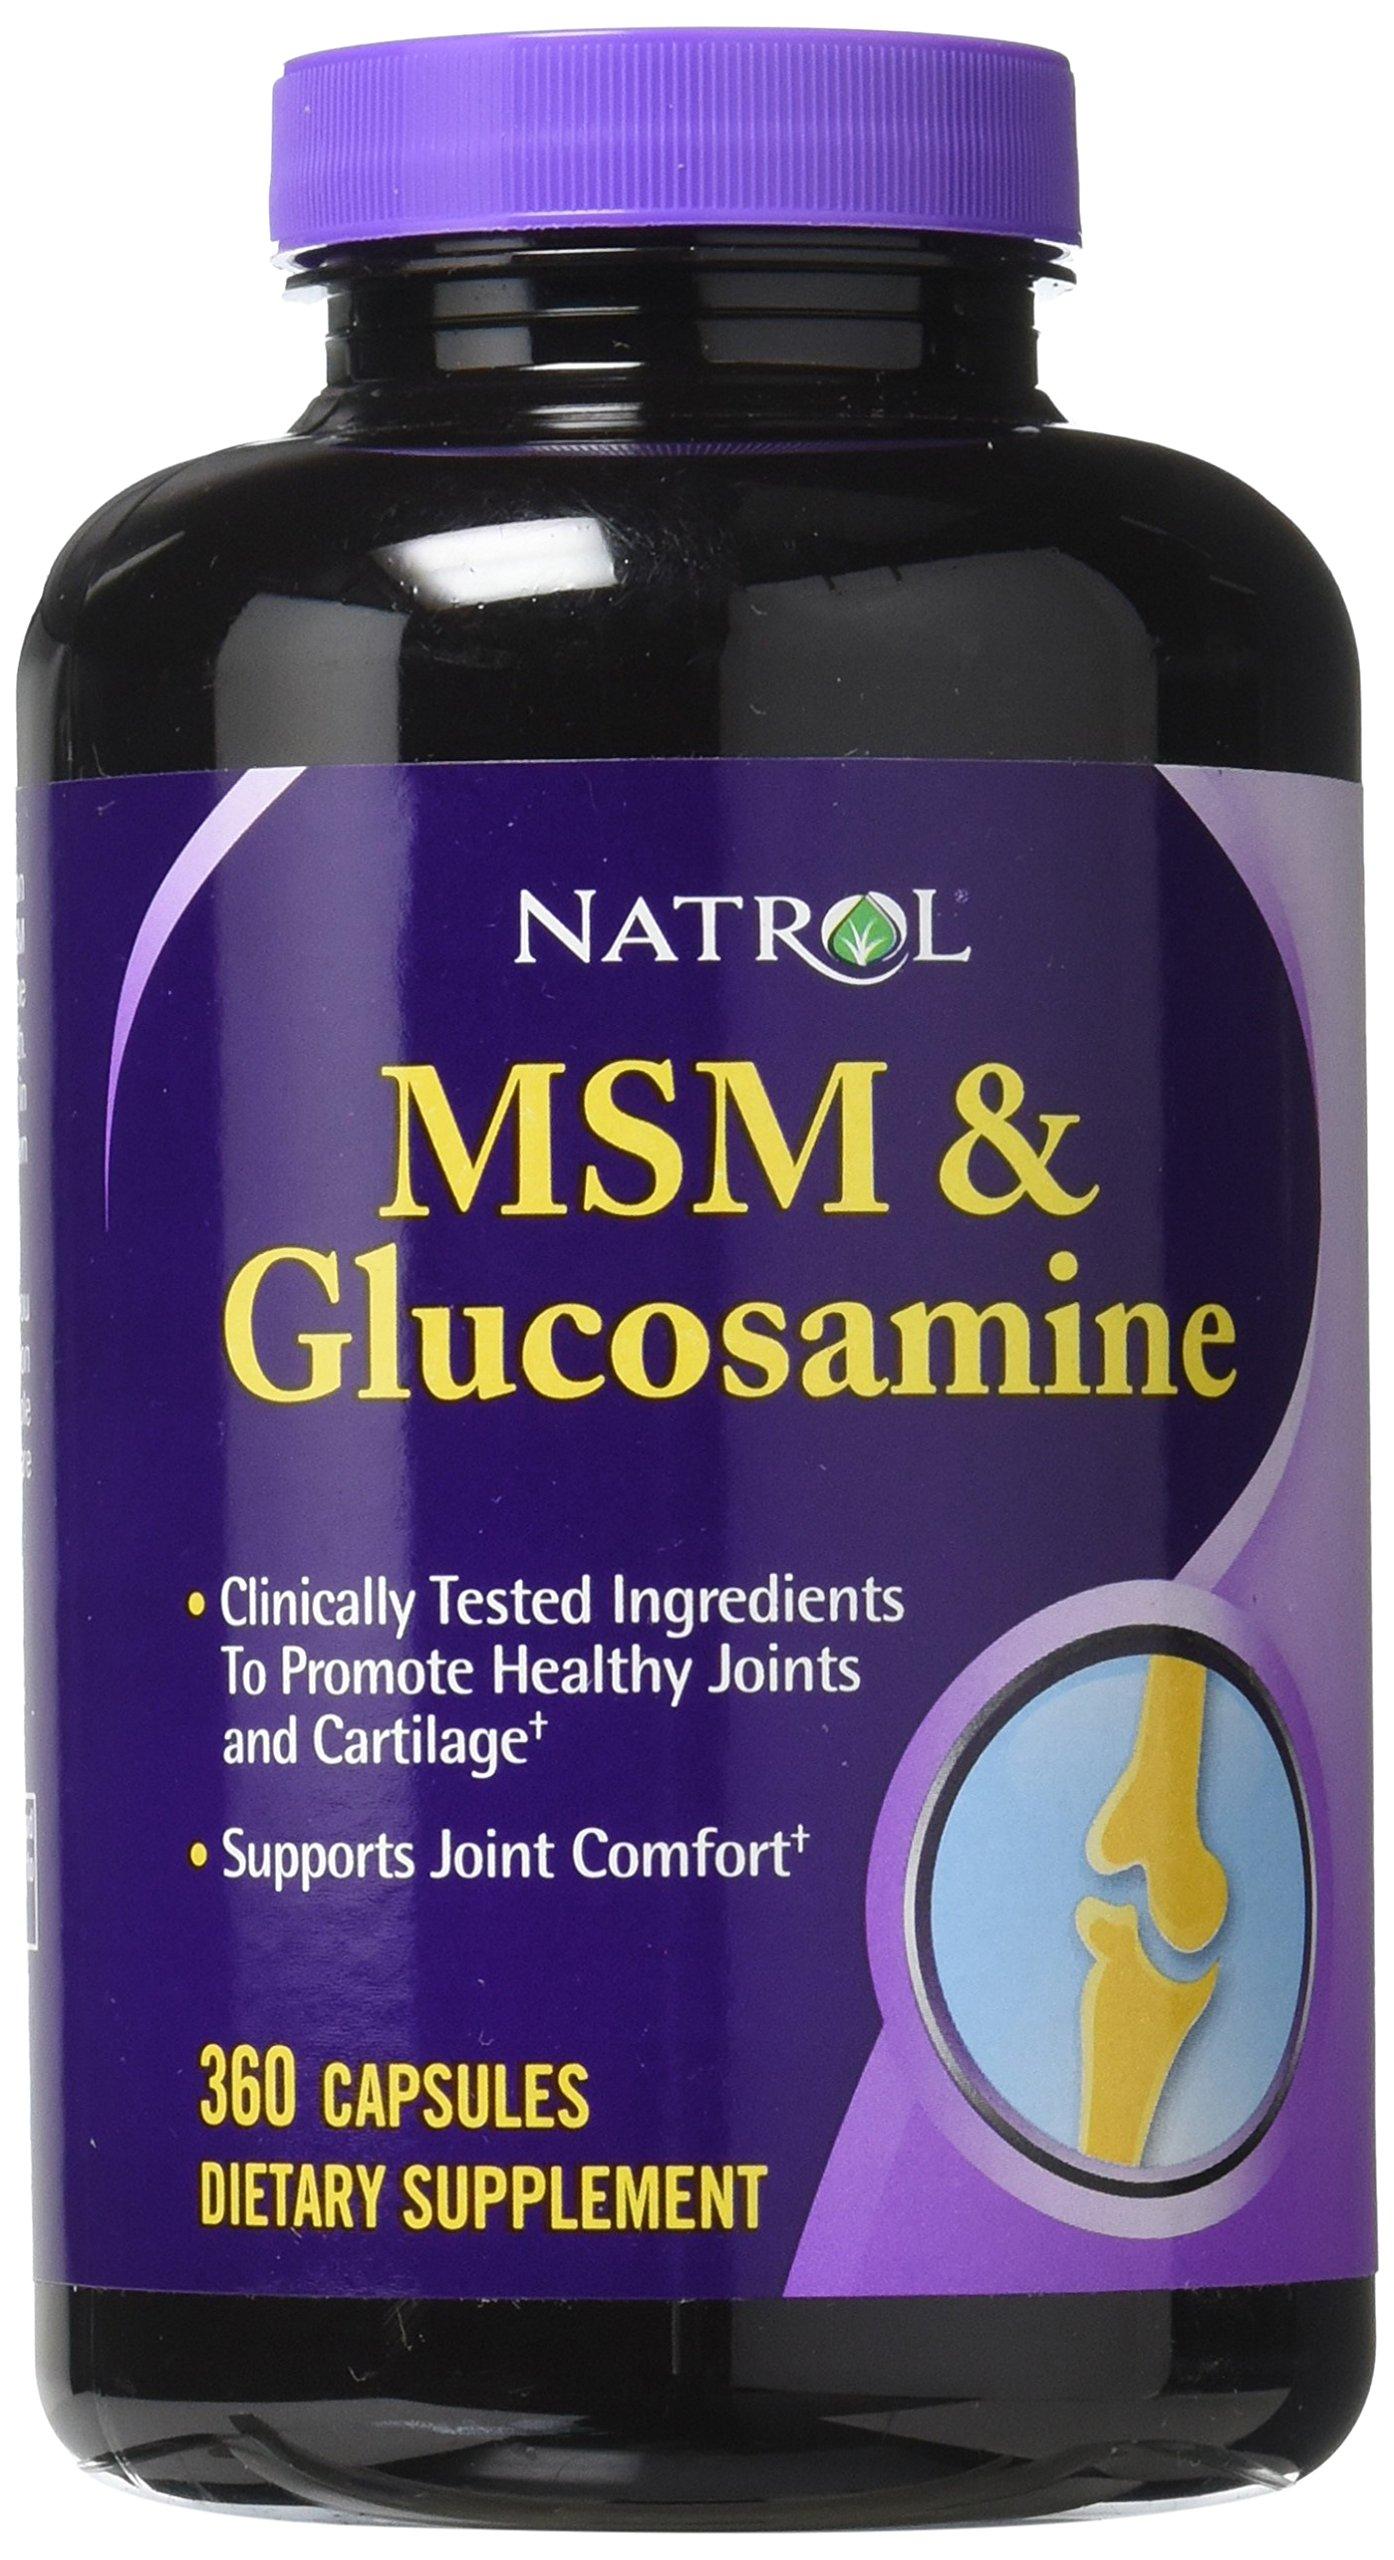 Natrol MSM & Glucosamine Capsules, 360 Count